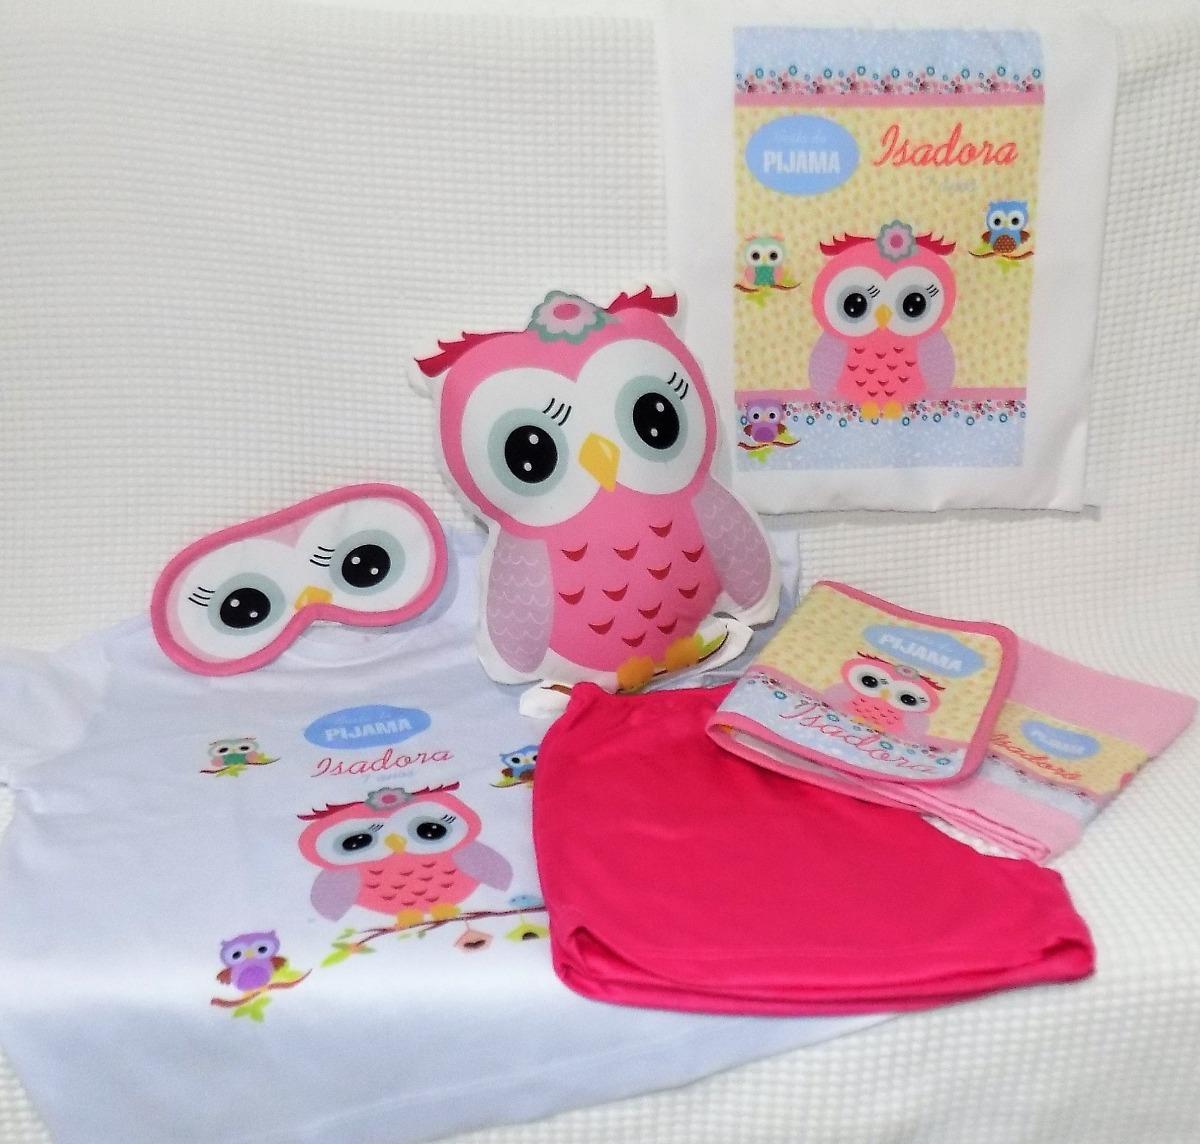 524275932ca761 5 Kits Pijama+neces.+toalha+almofada+bolsa+mascara+chinelo